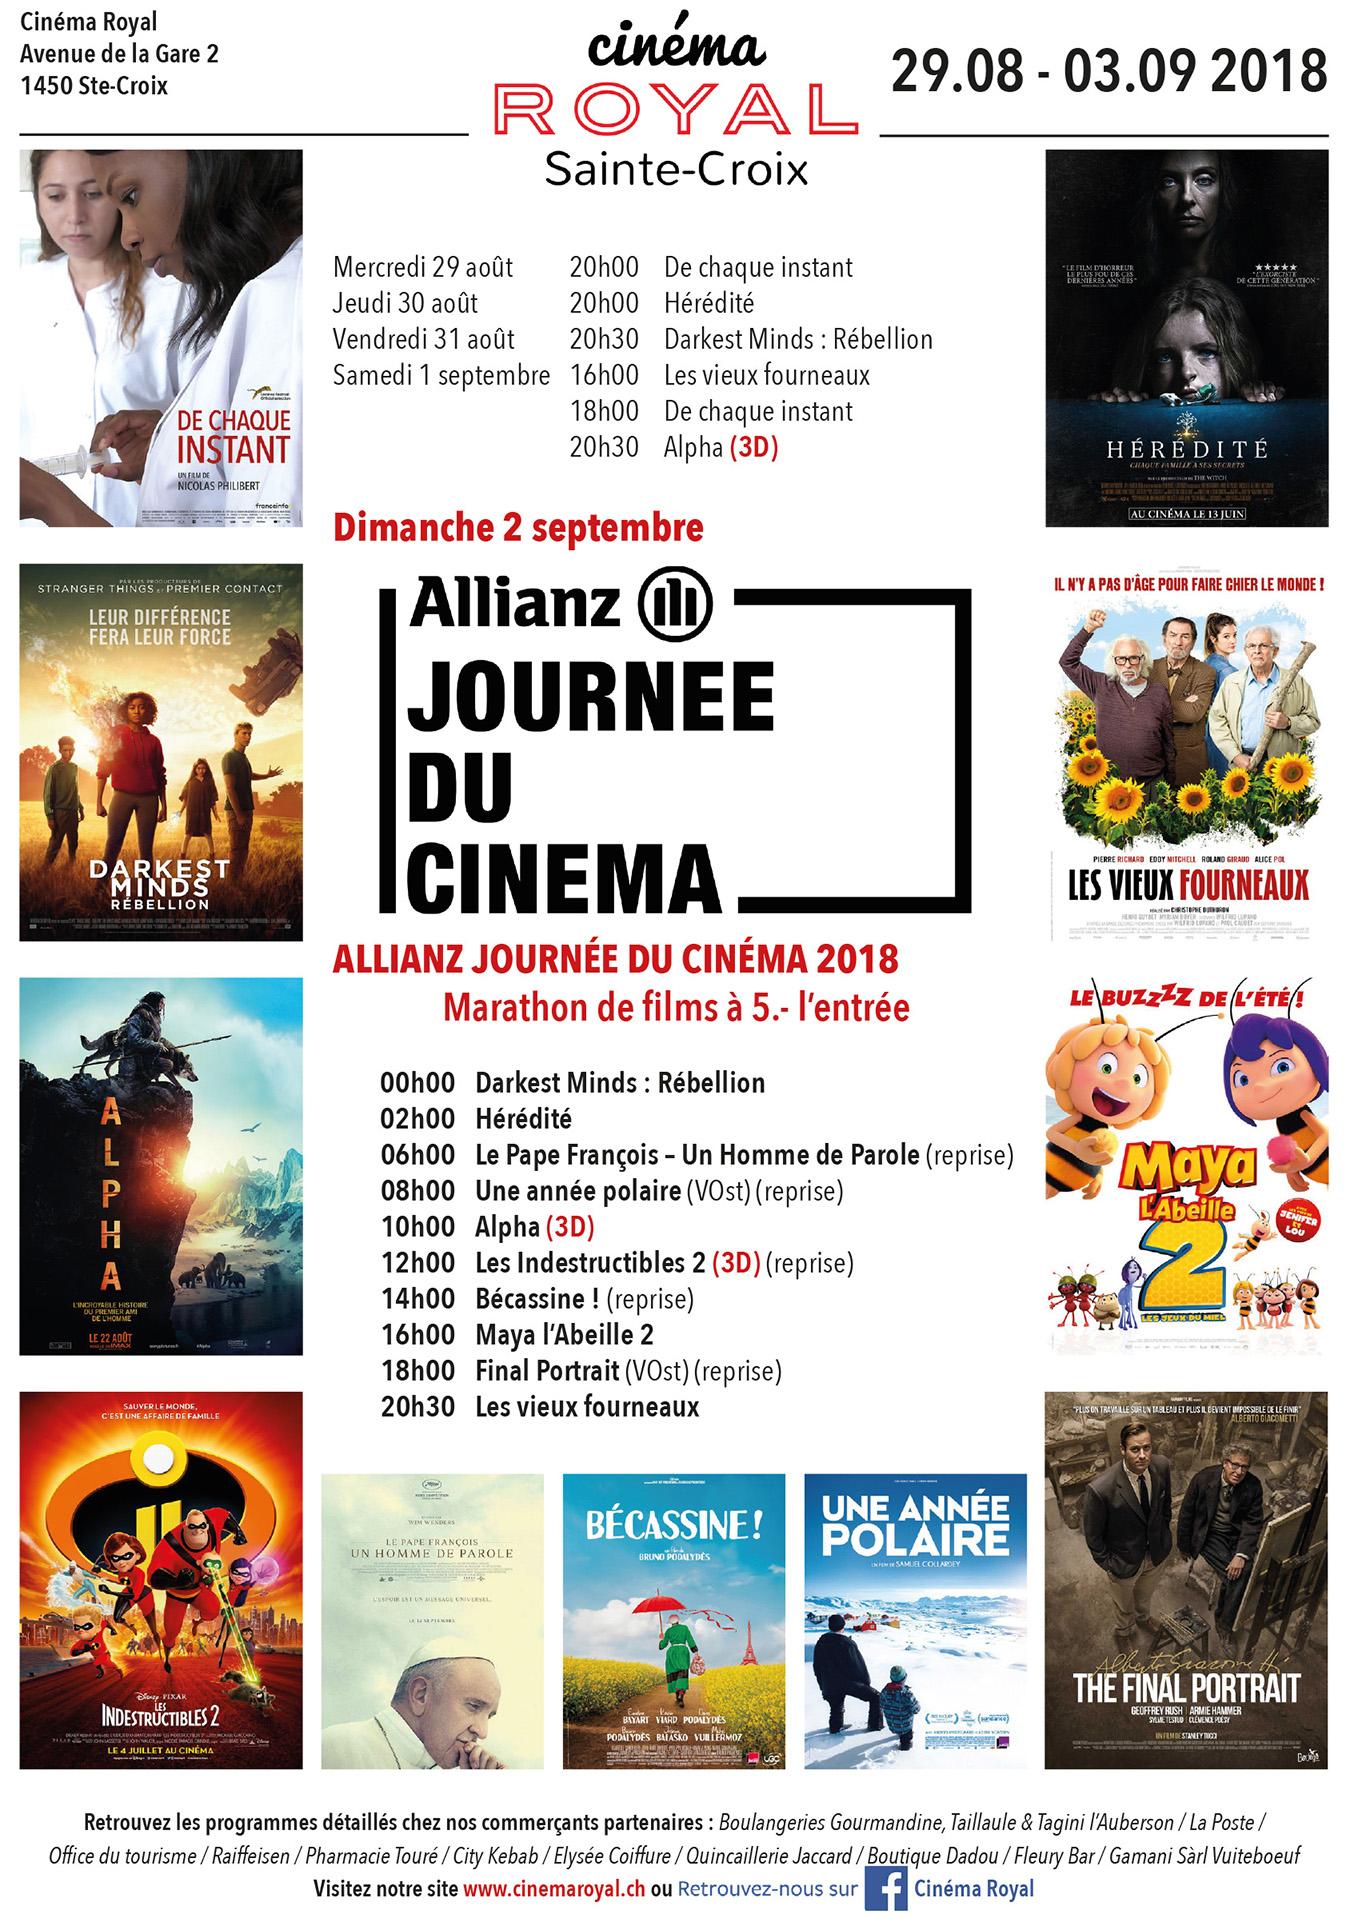 Nicolas Cinema Royal